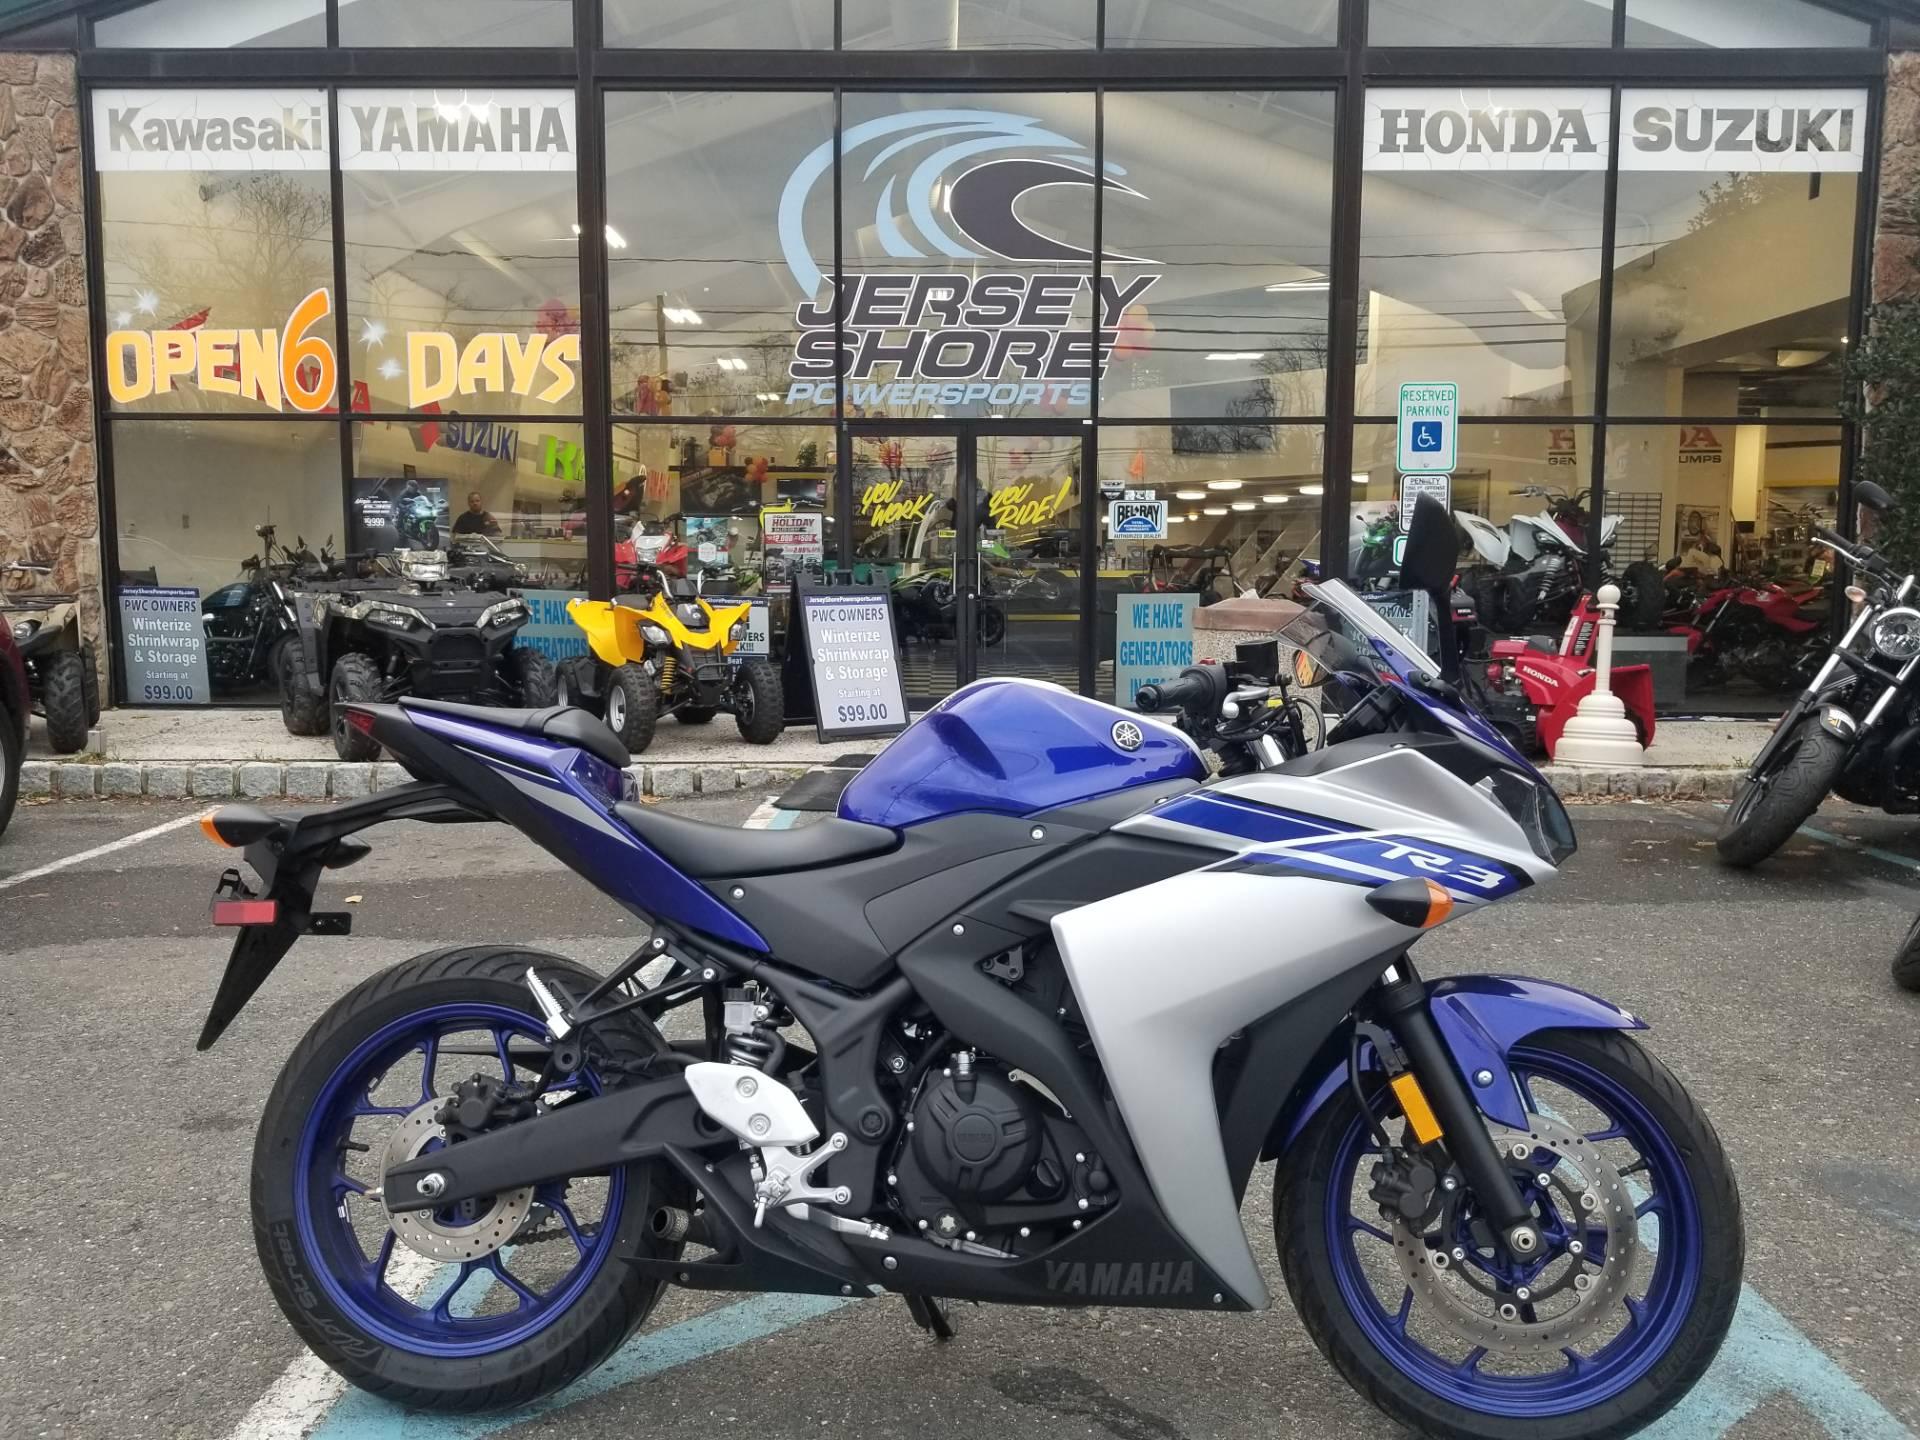 2016 Yamaha YZF-R3 for sale 15892